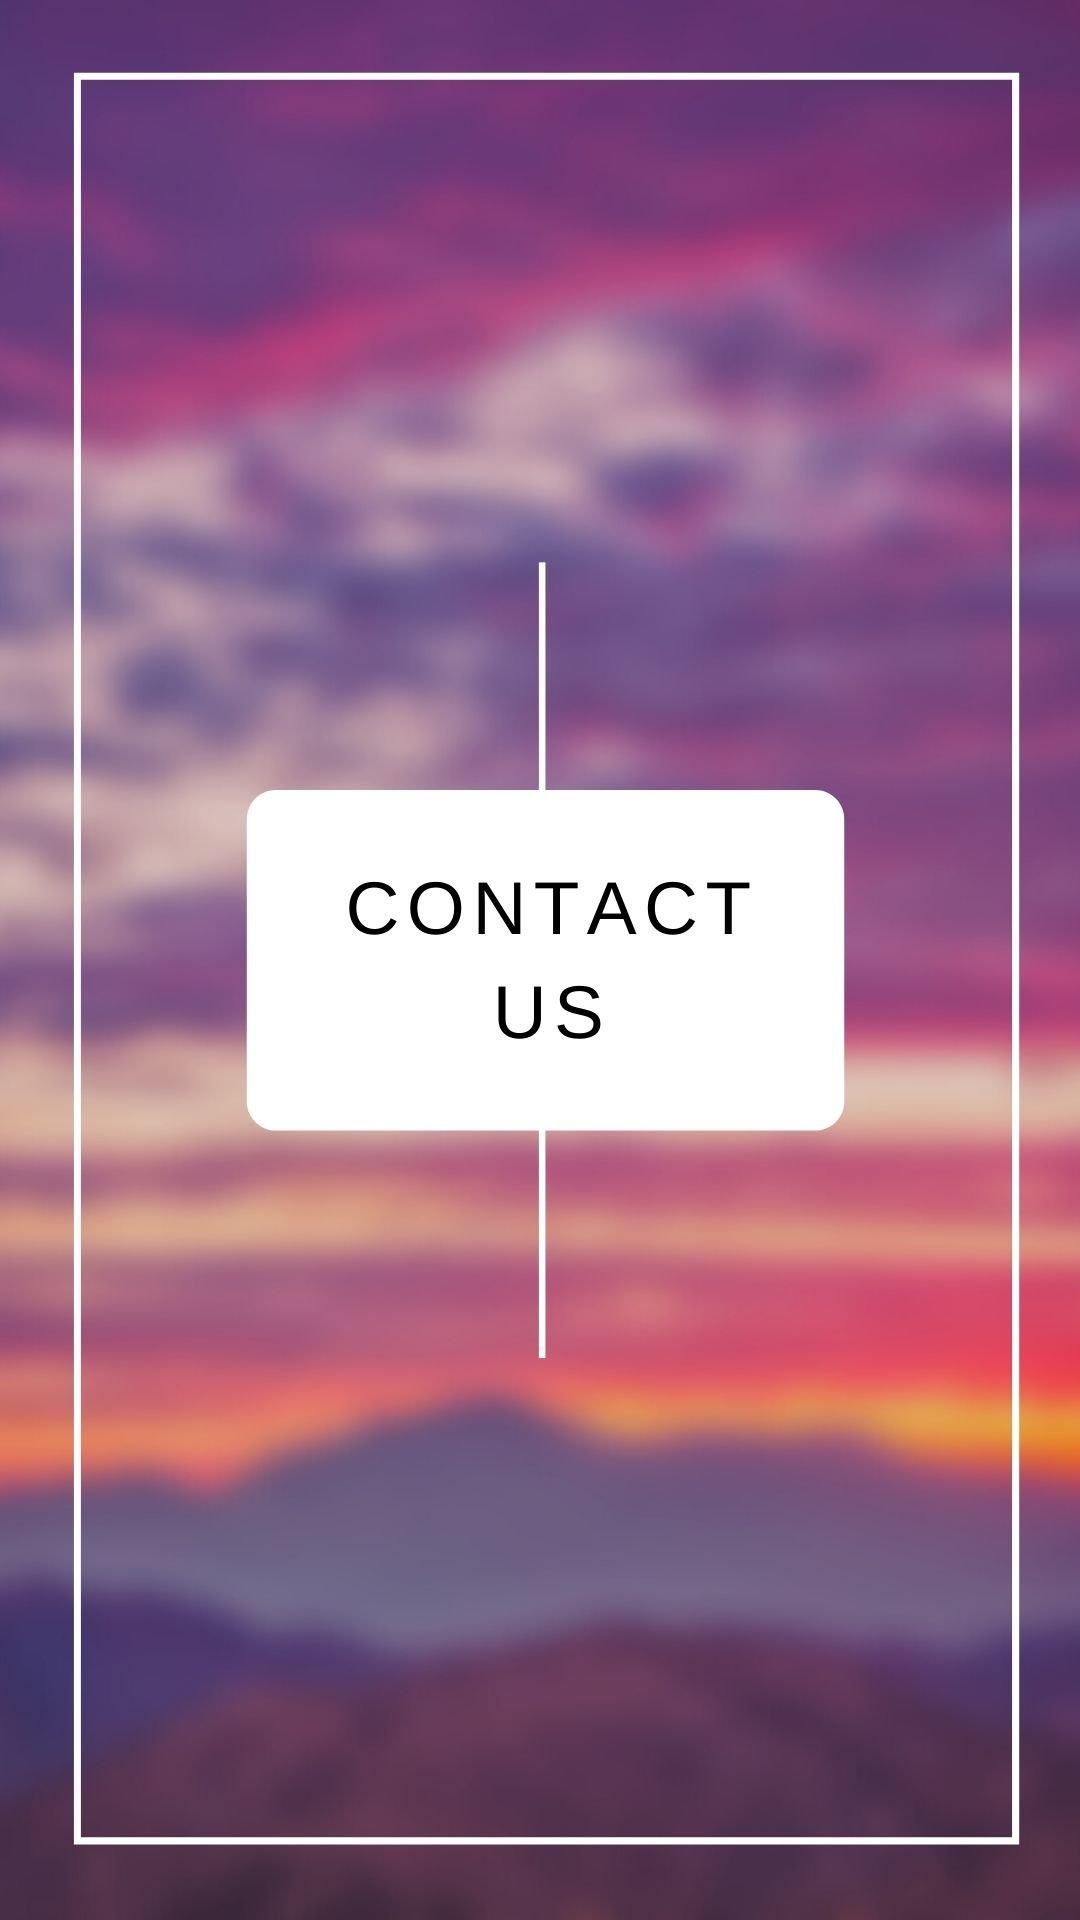 contact sullivan J photography